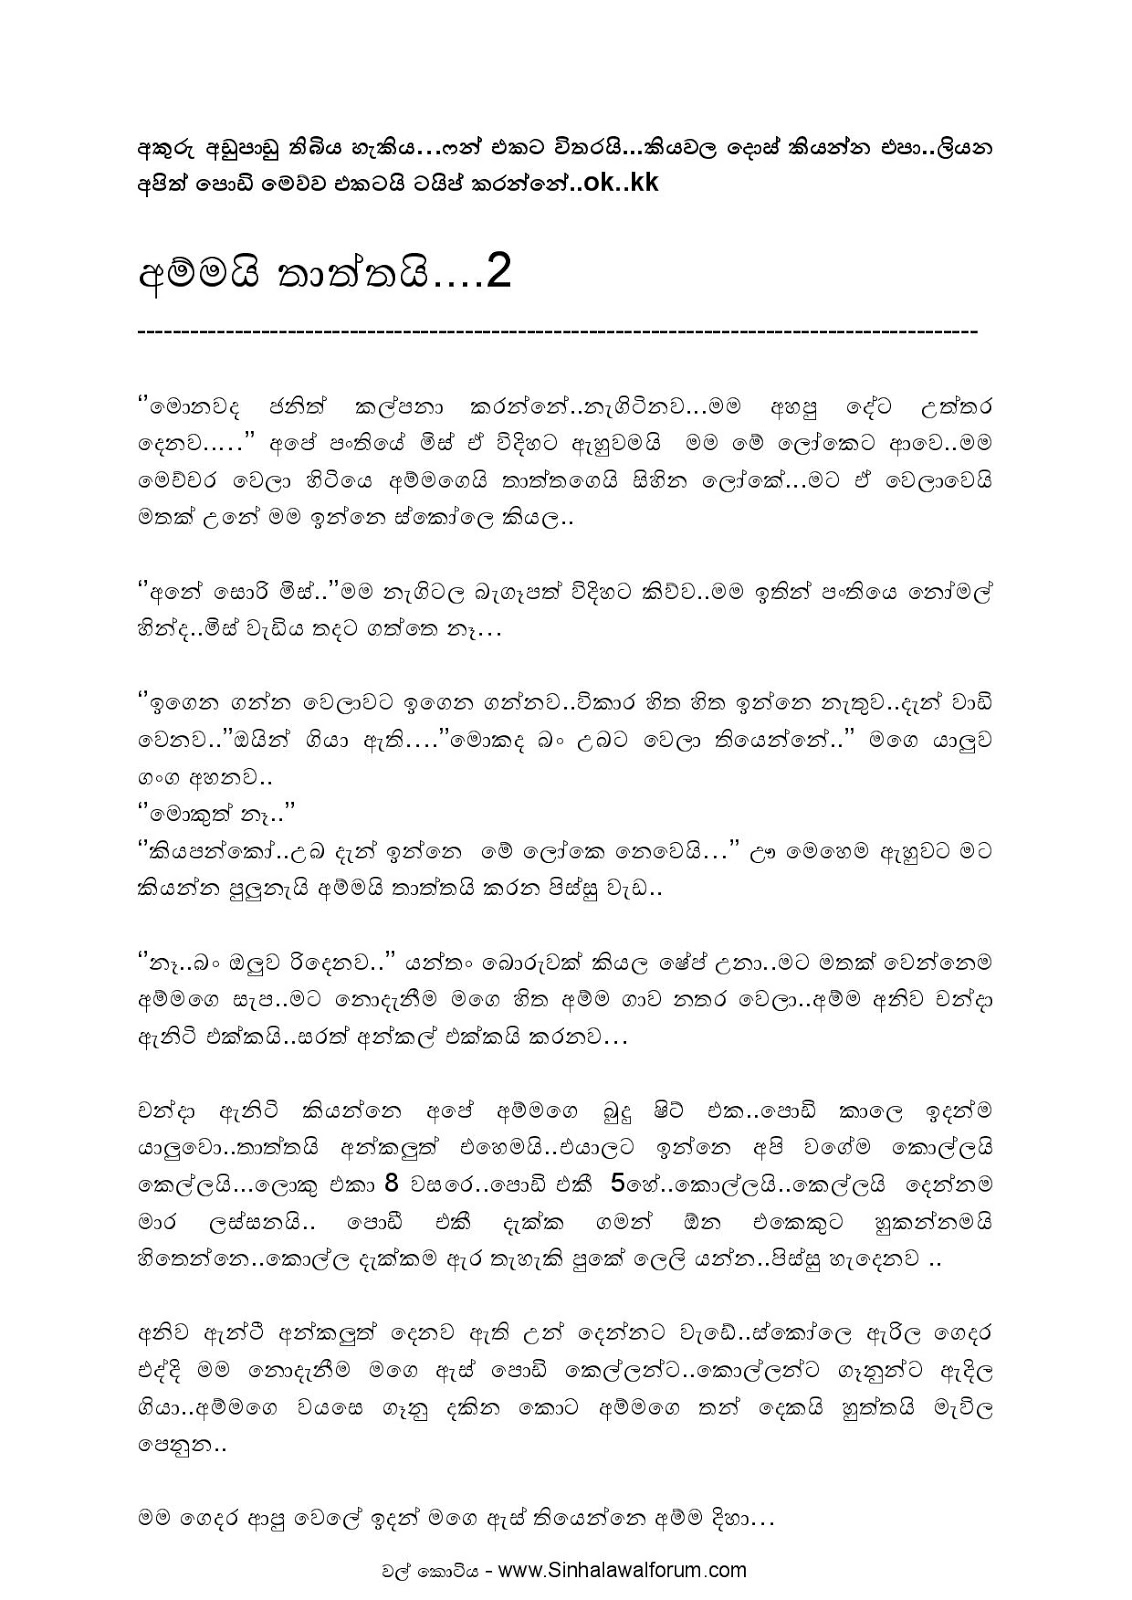 Sinhala Wal Katha Punchi 3 - Modern Home Revolution